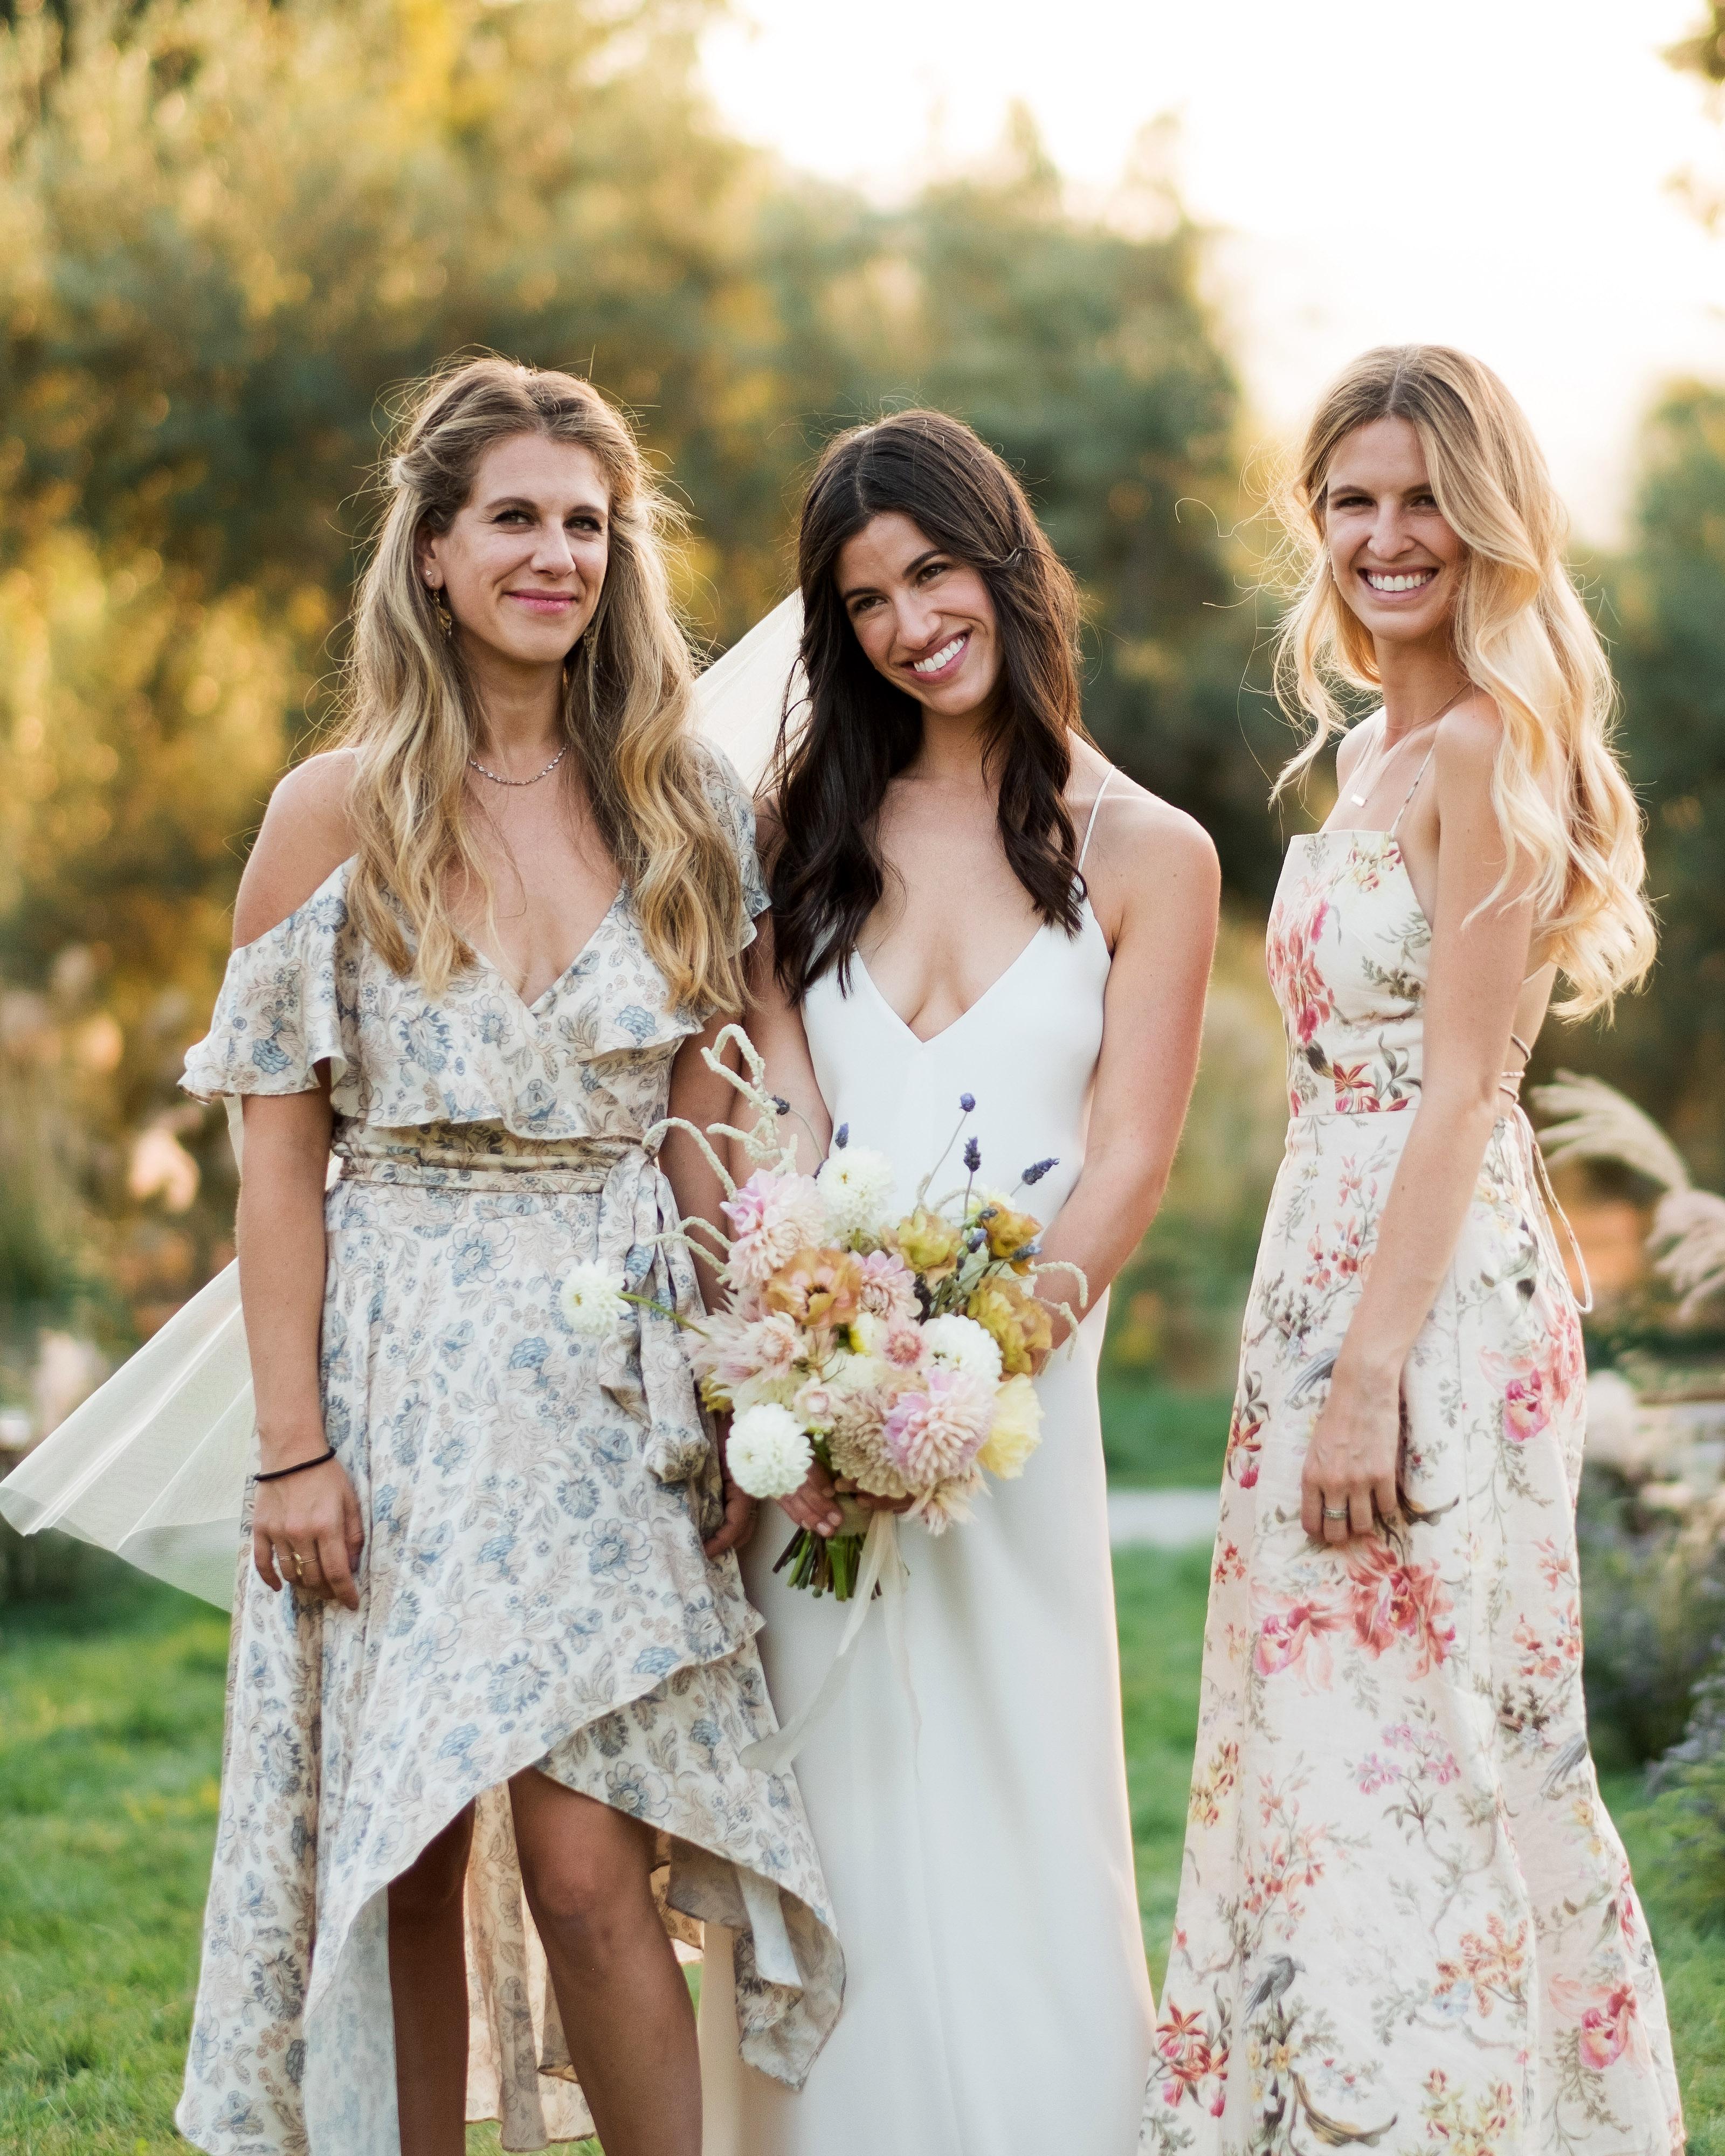 anika max wedding bridesmaids wearing floral mismatched dresses